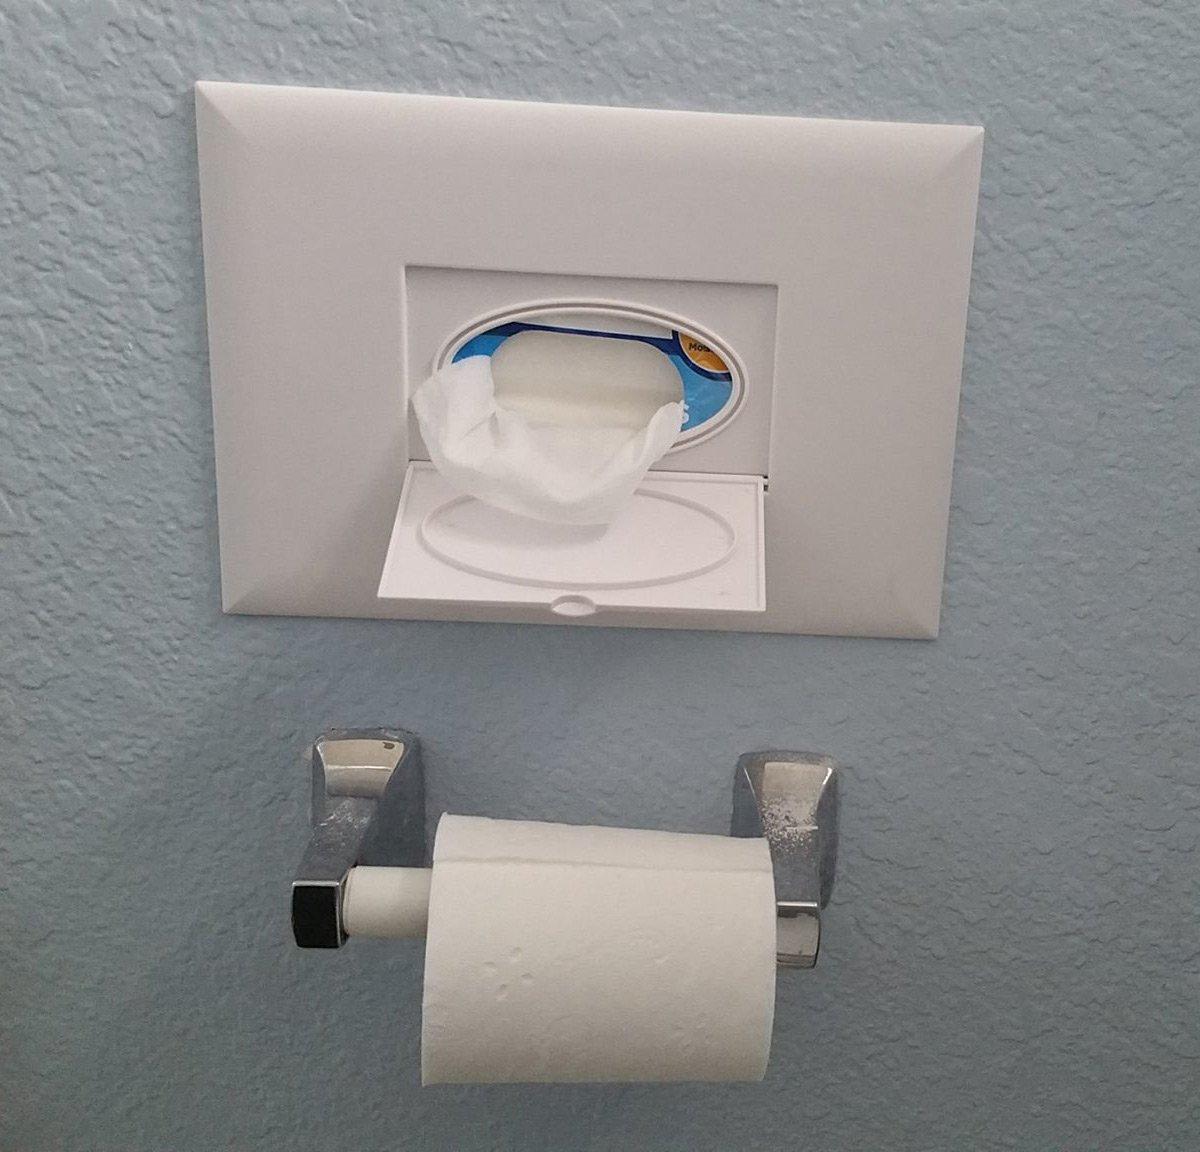 Bathroom Design Magazines Forever Fresh In Wall Wet Wipe Dispenser The Green Head